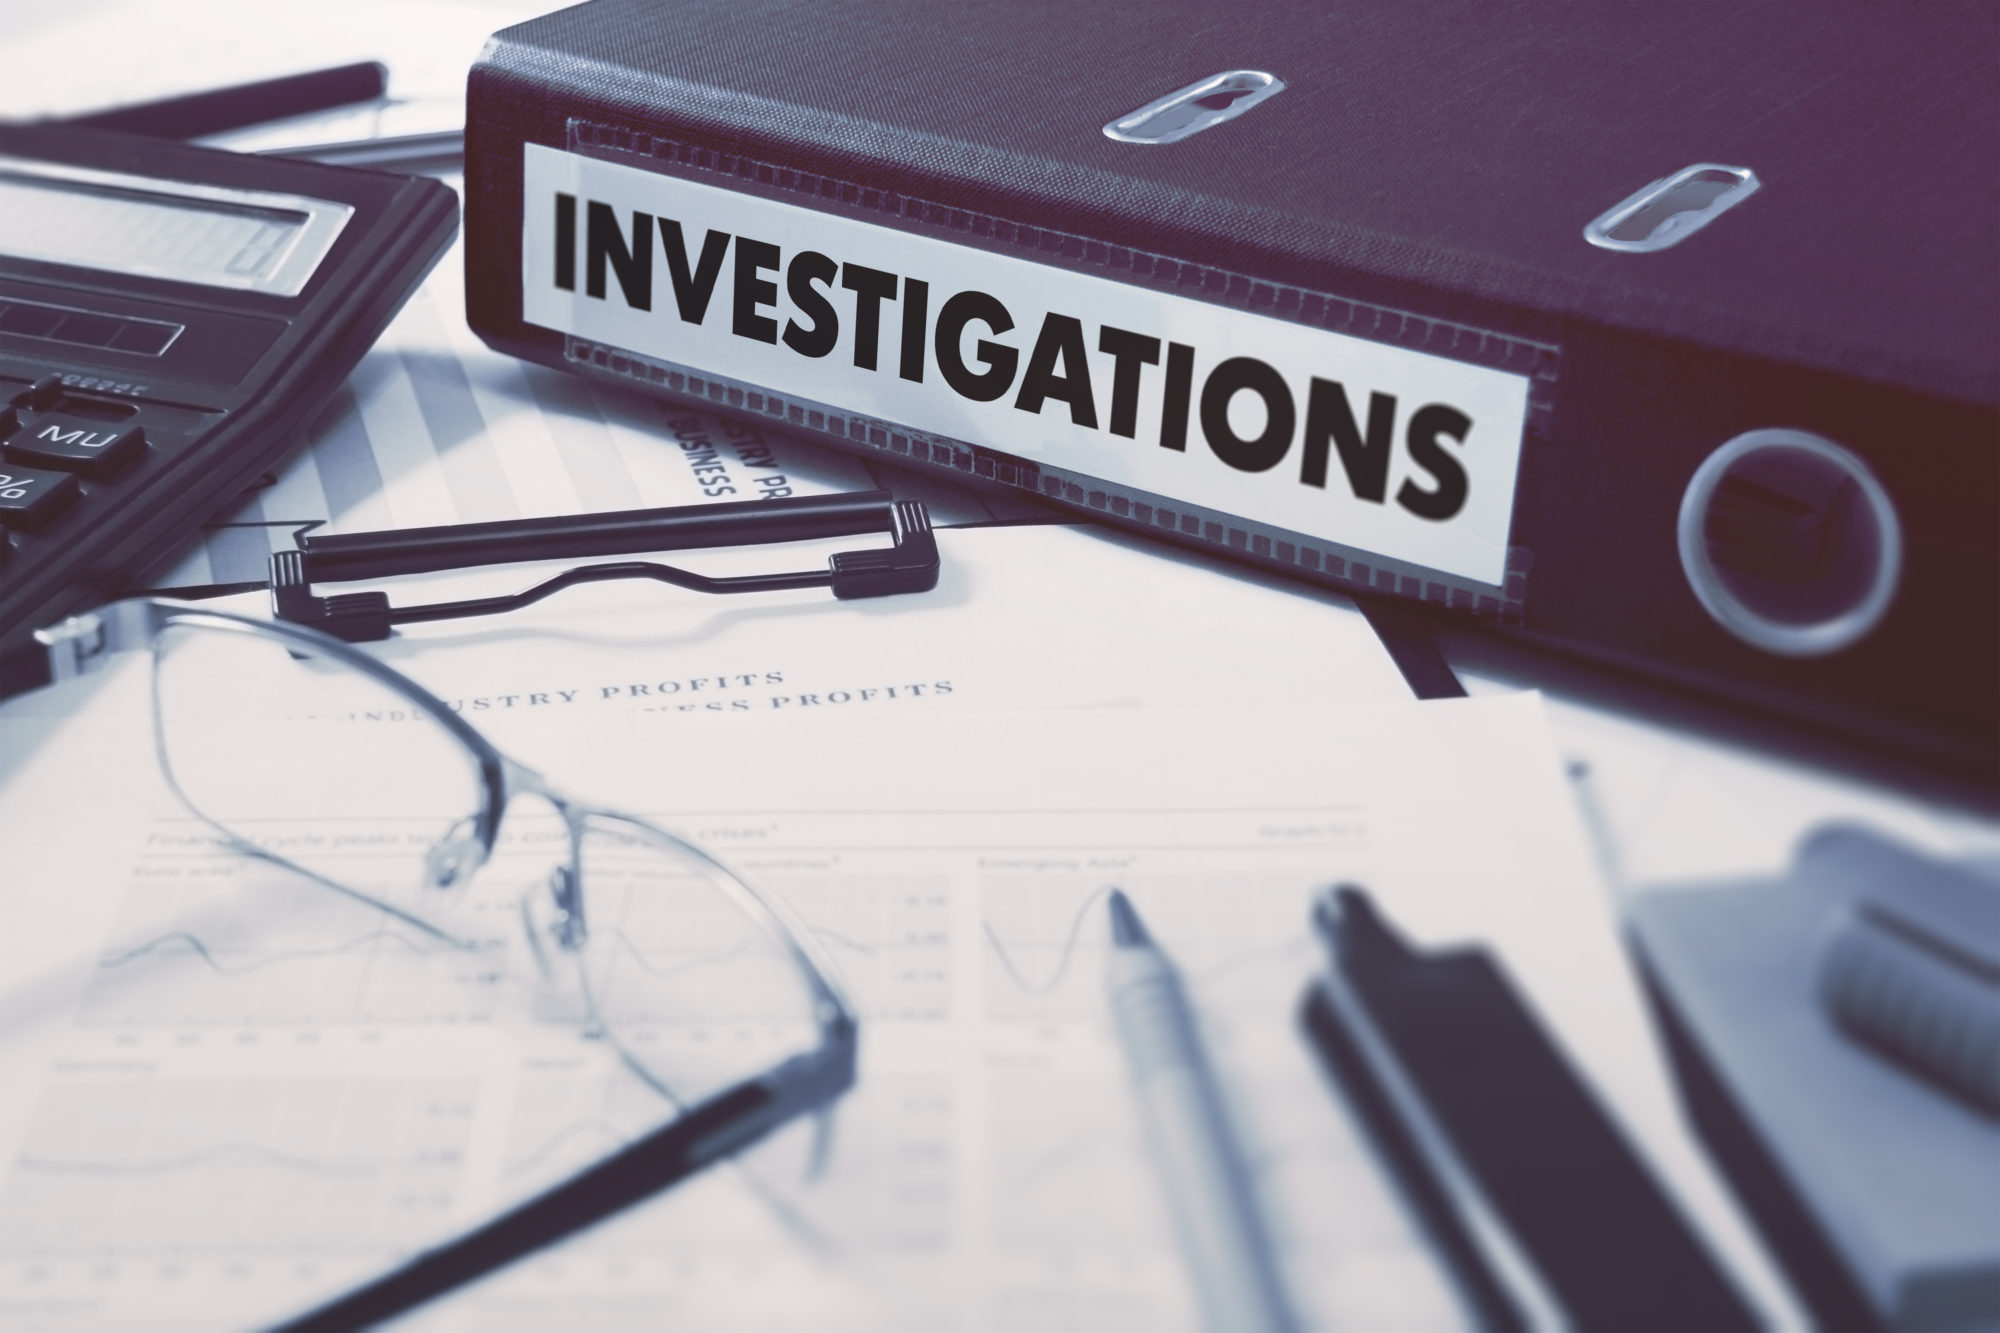 Protecting Investigators